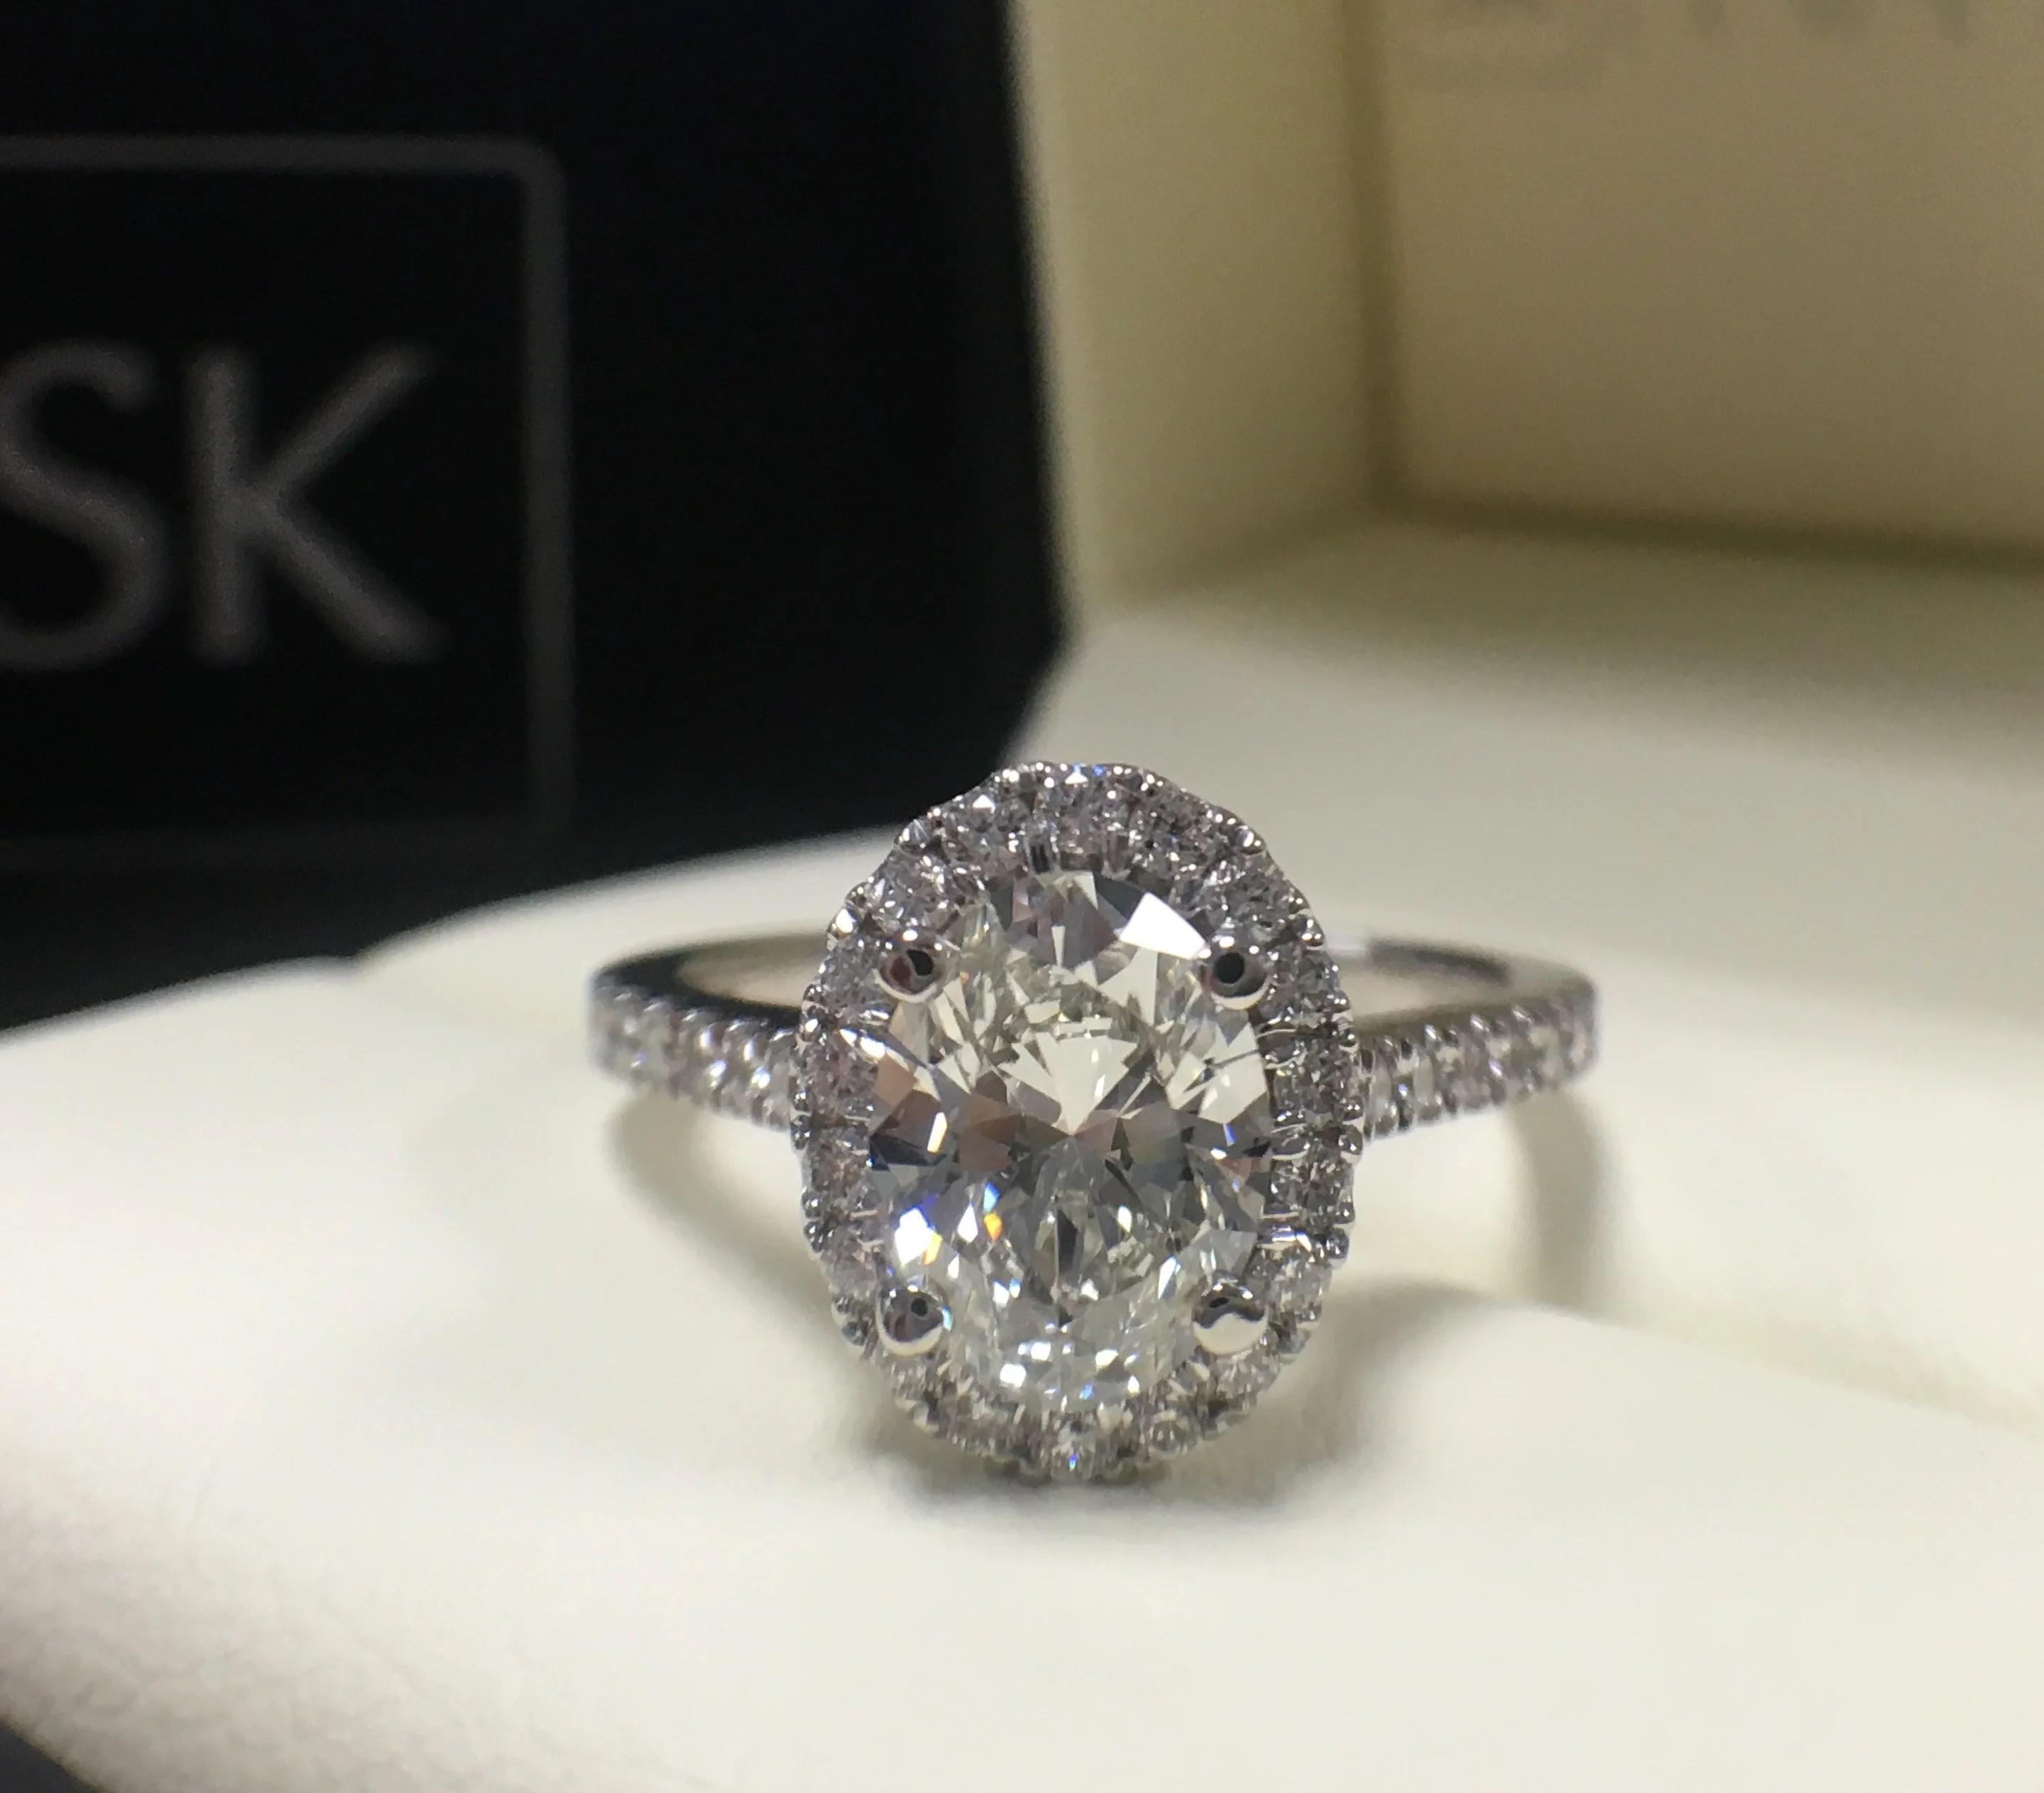 Engagement Rings Toronto  Diamond Jewellery  Wedding Bands  Custom Rings Design  Loose Diamonds